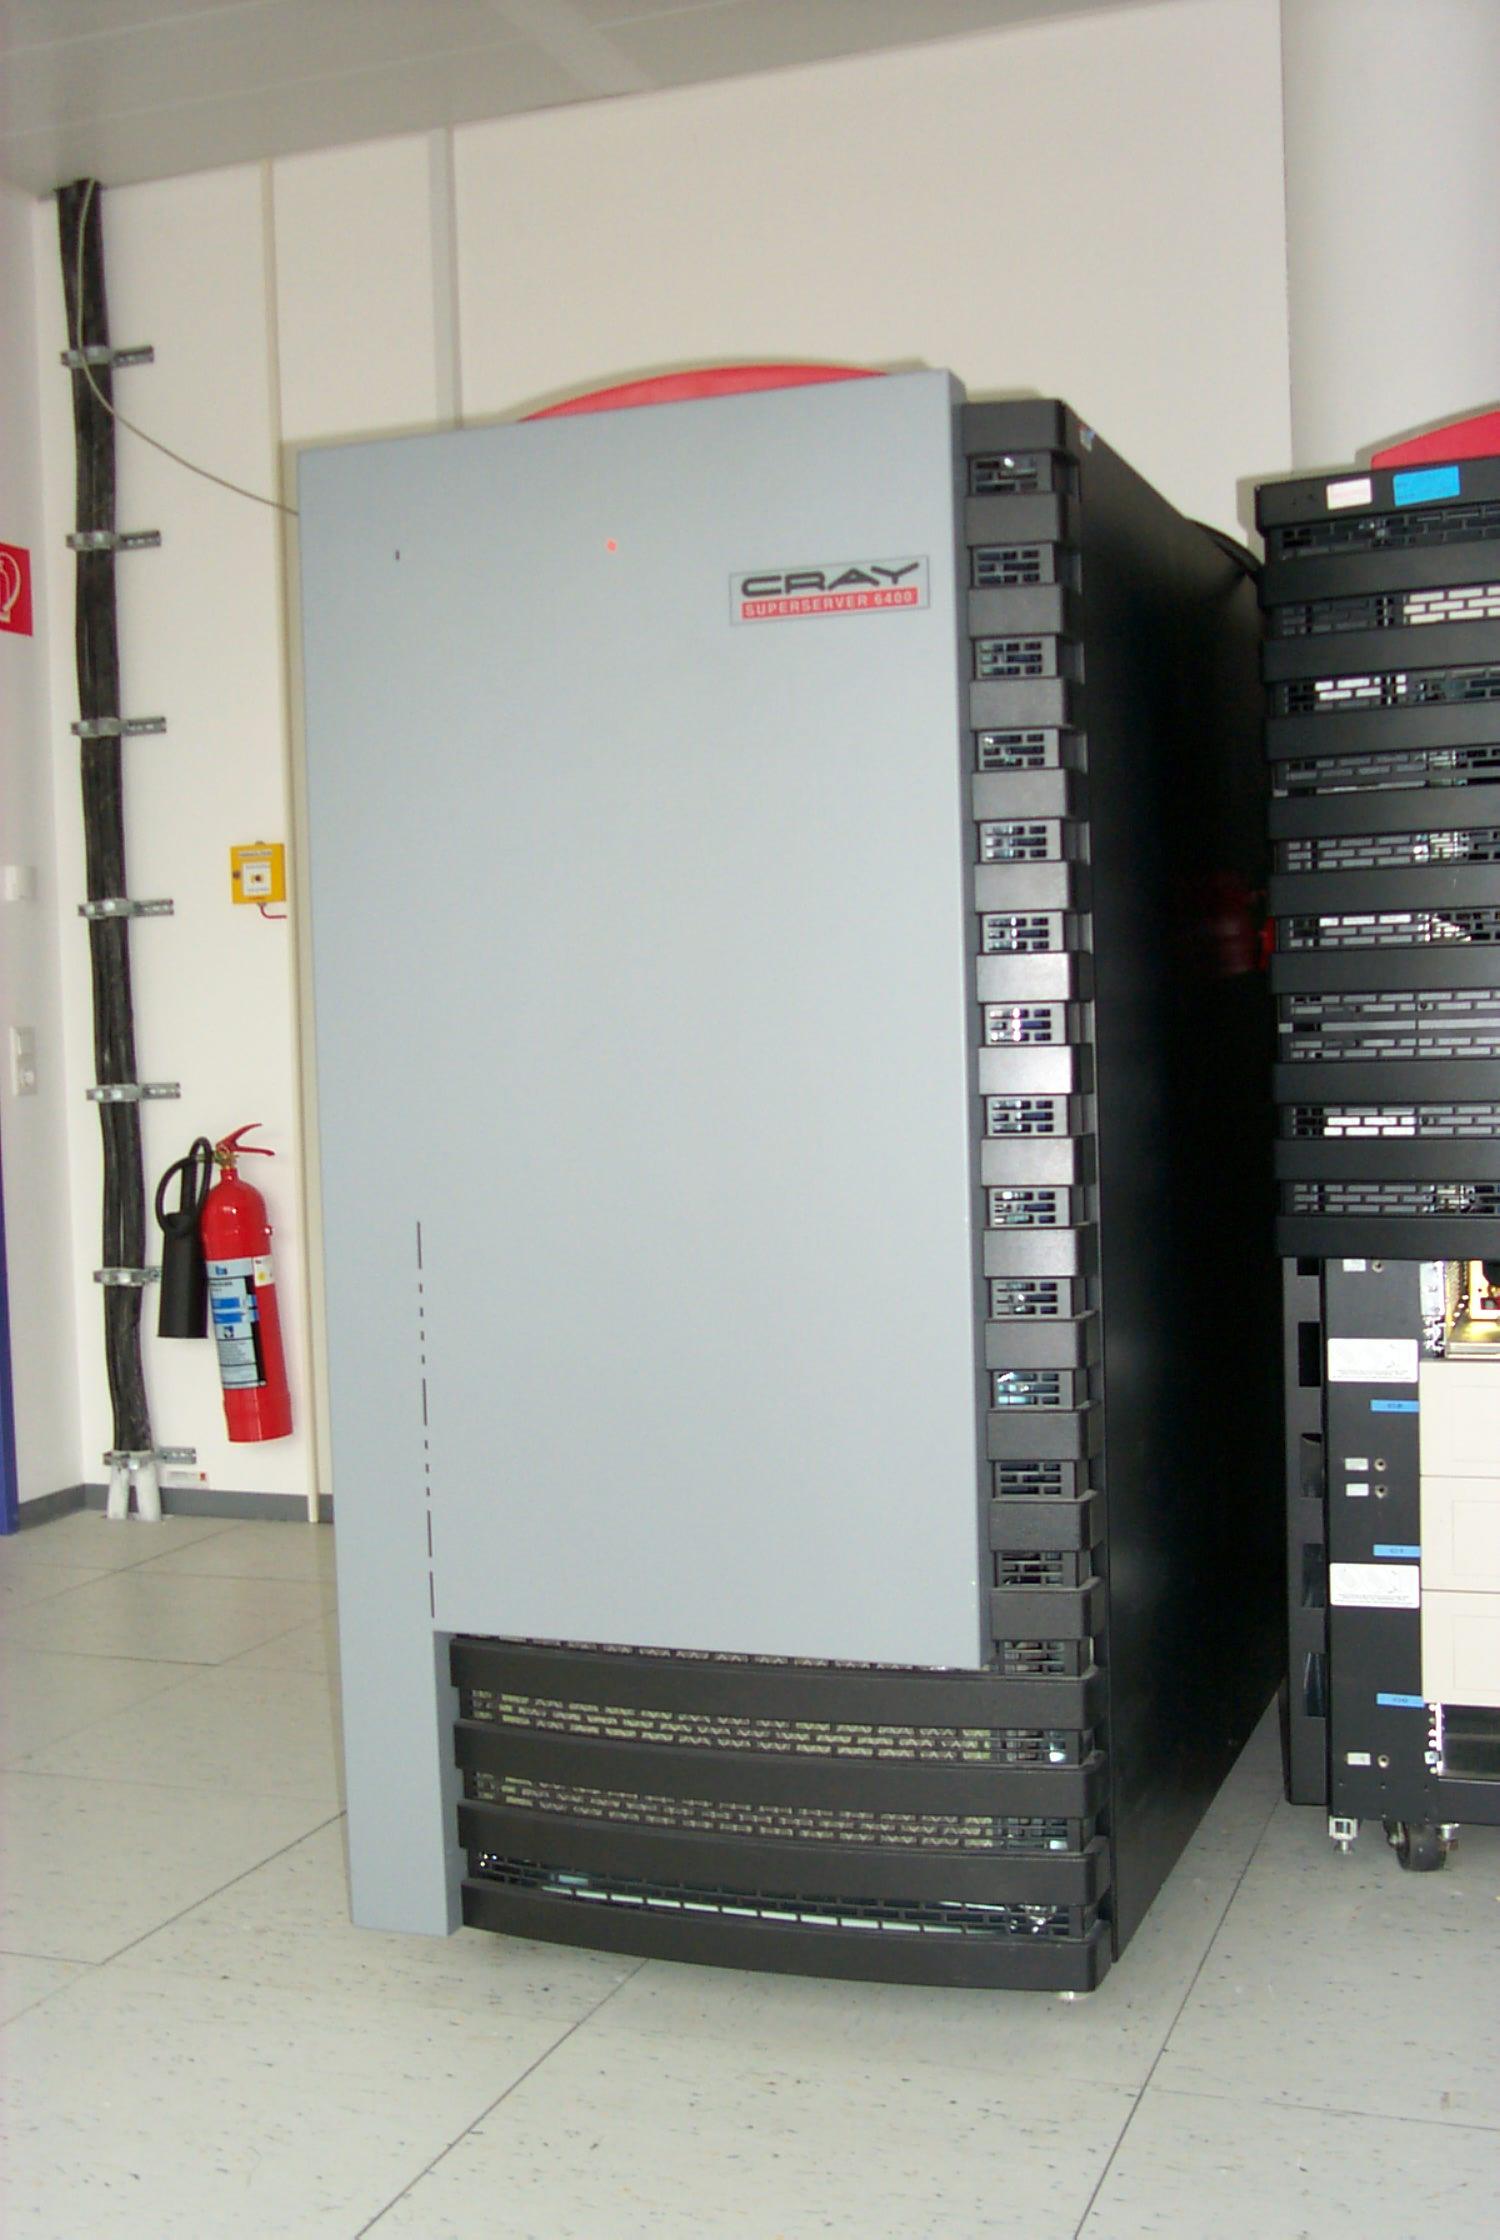 Quake Cray 6400